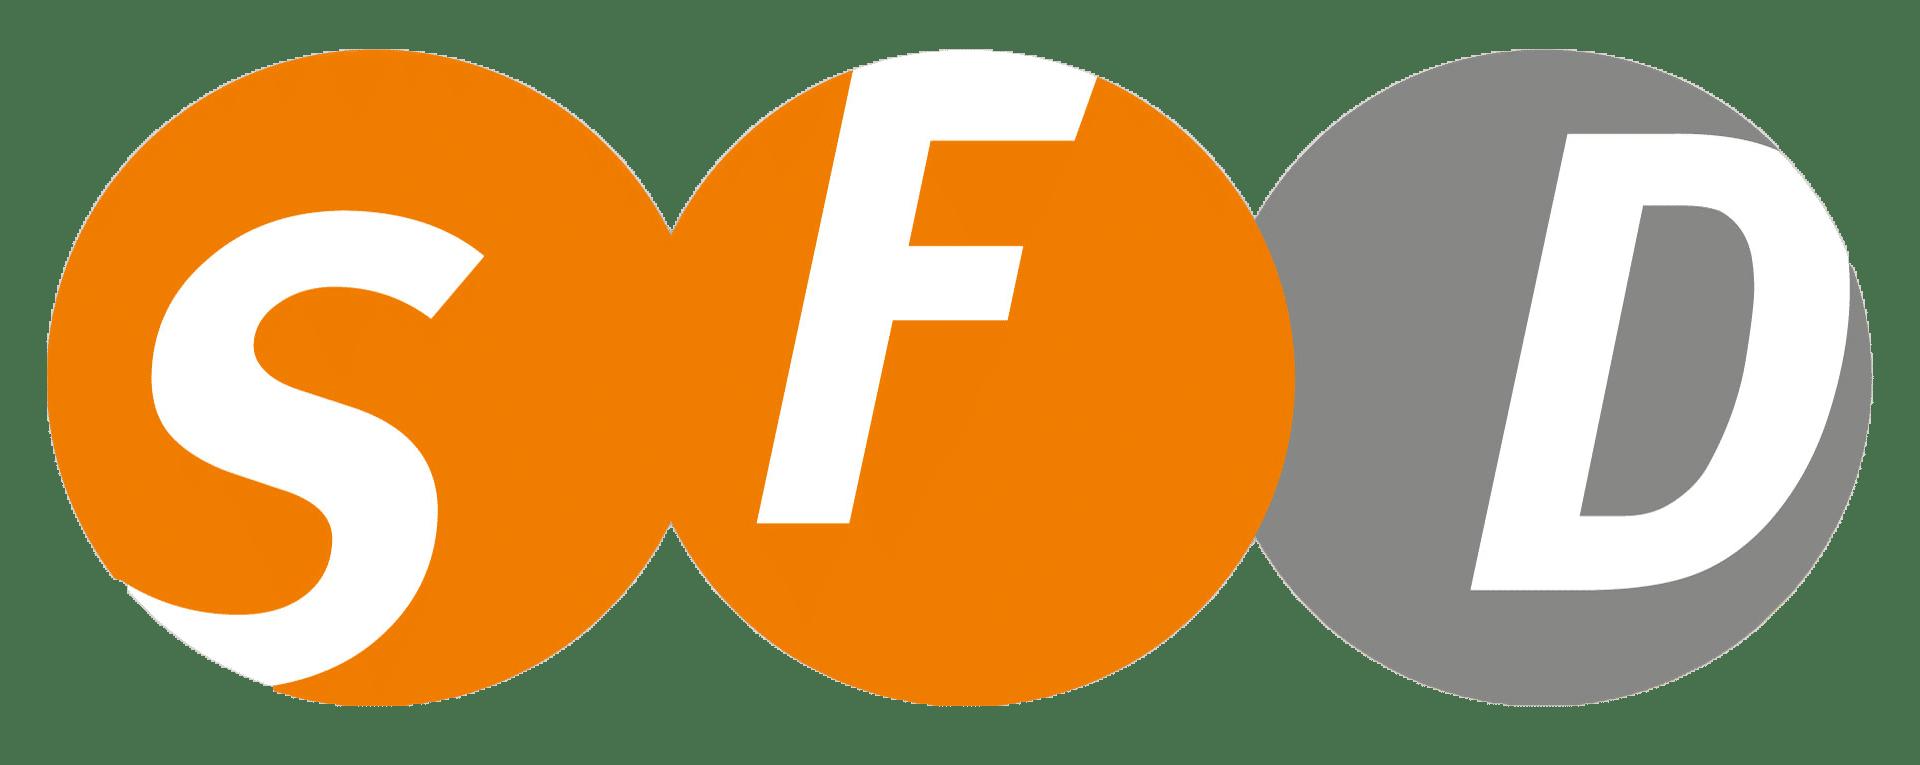 Werbetechnik Frank, Autobeschriftung, Digitaldruck